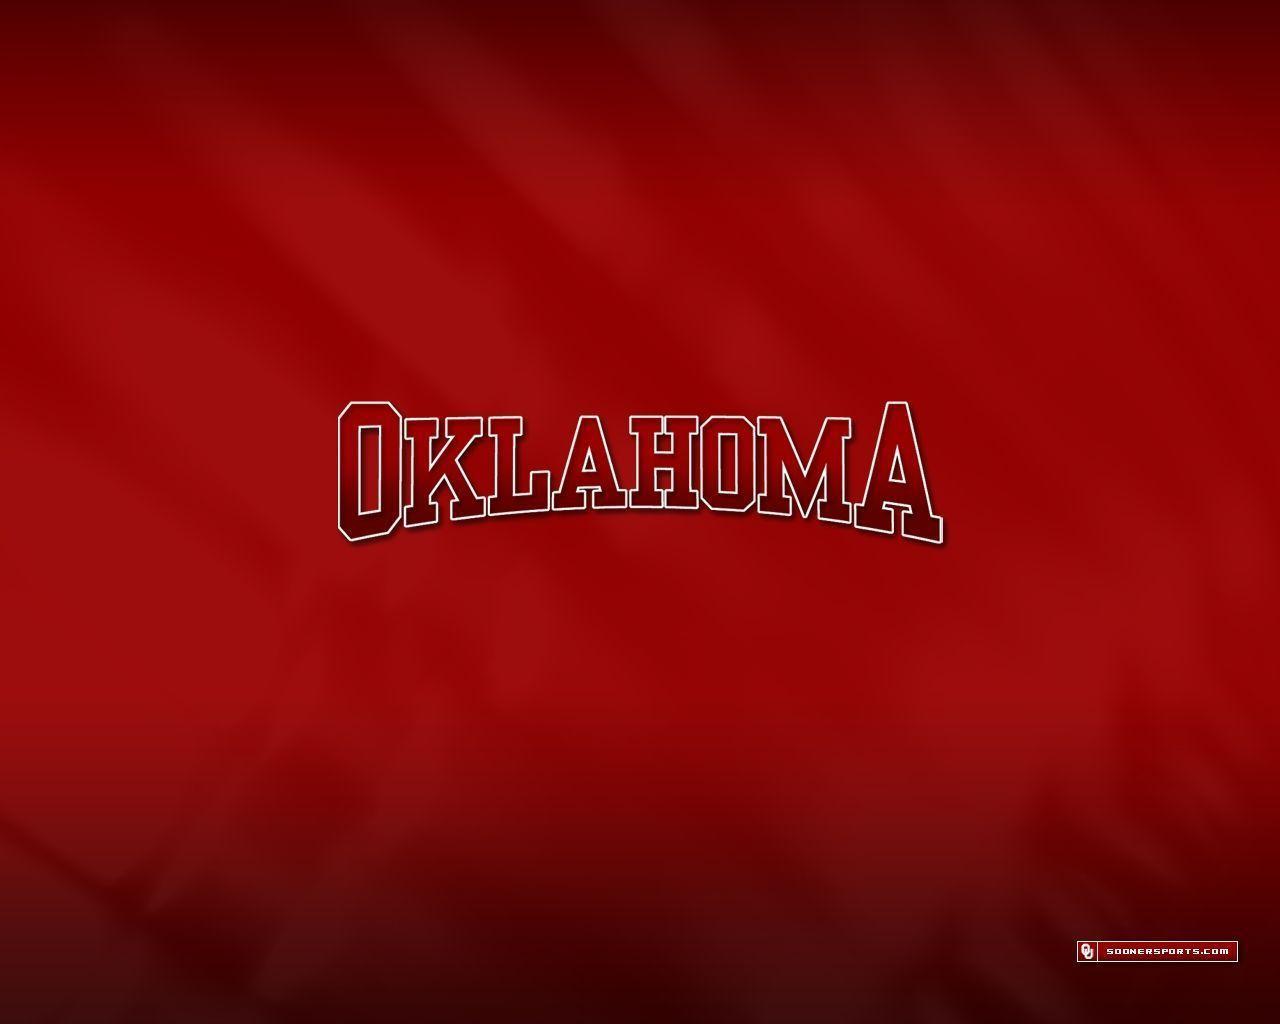 Oklahoma Sooners Backgrounds 1280x1024